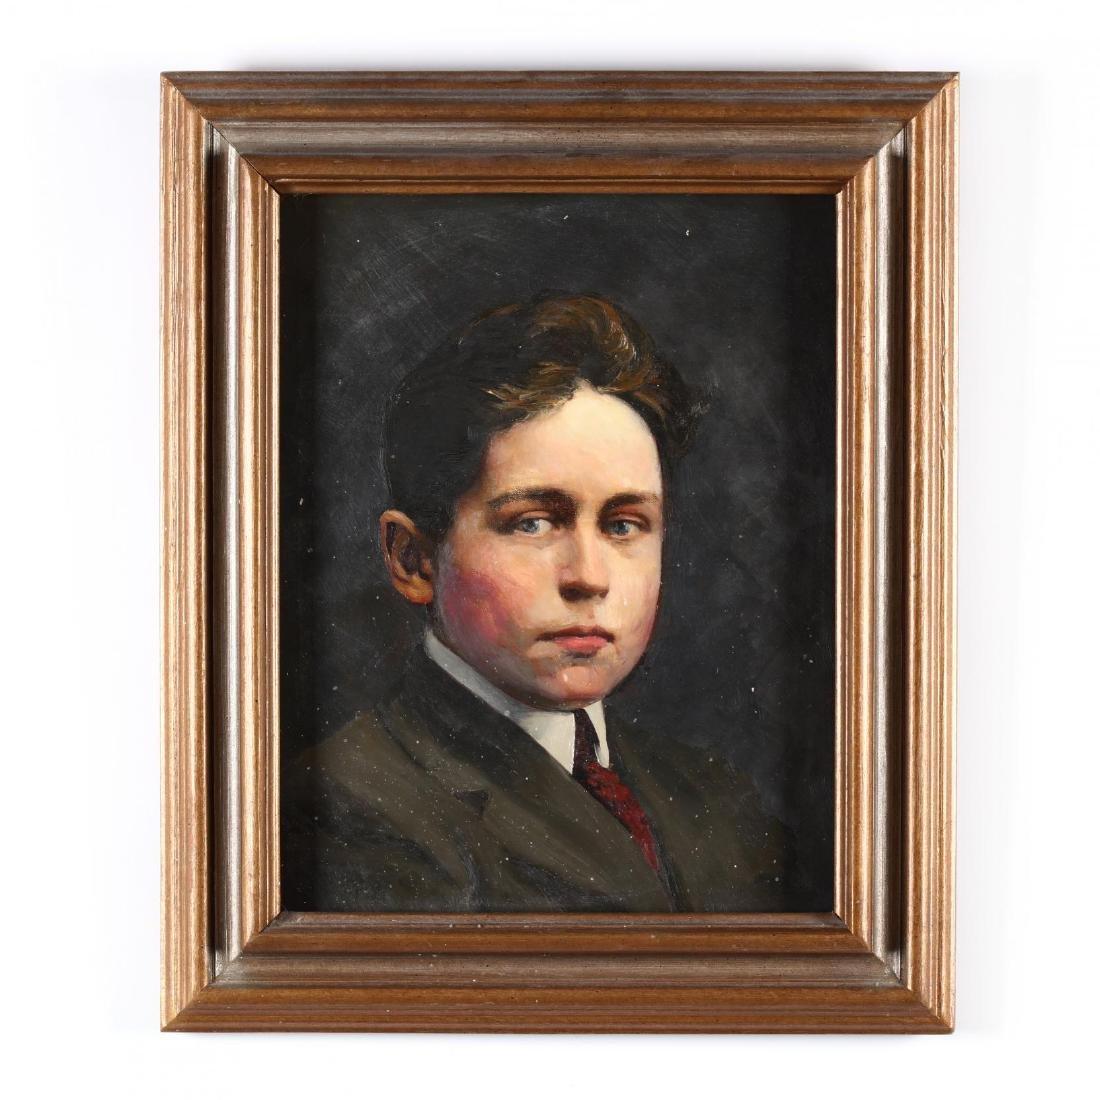 Vintage Portrait of a Young Man, circa 1920